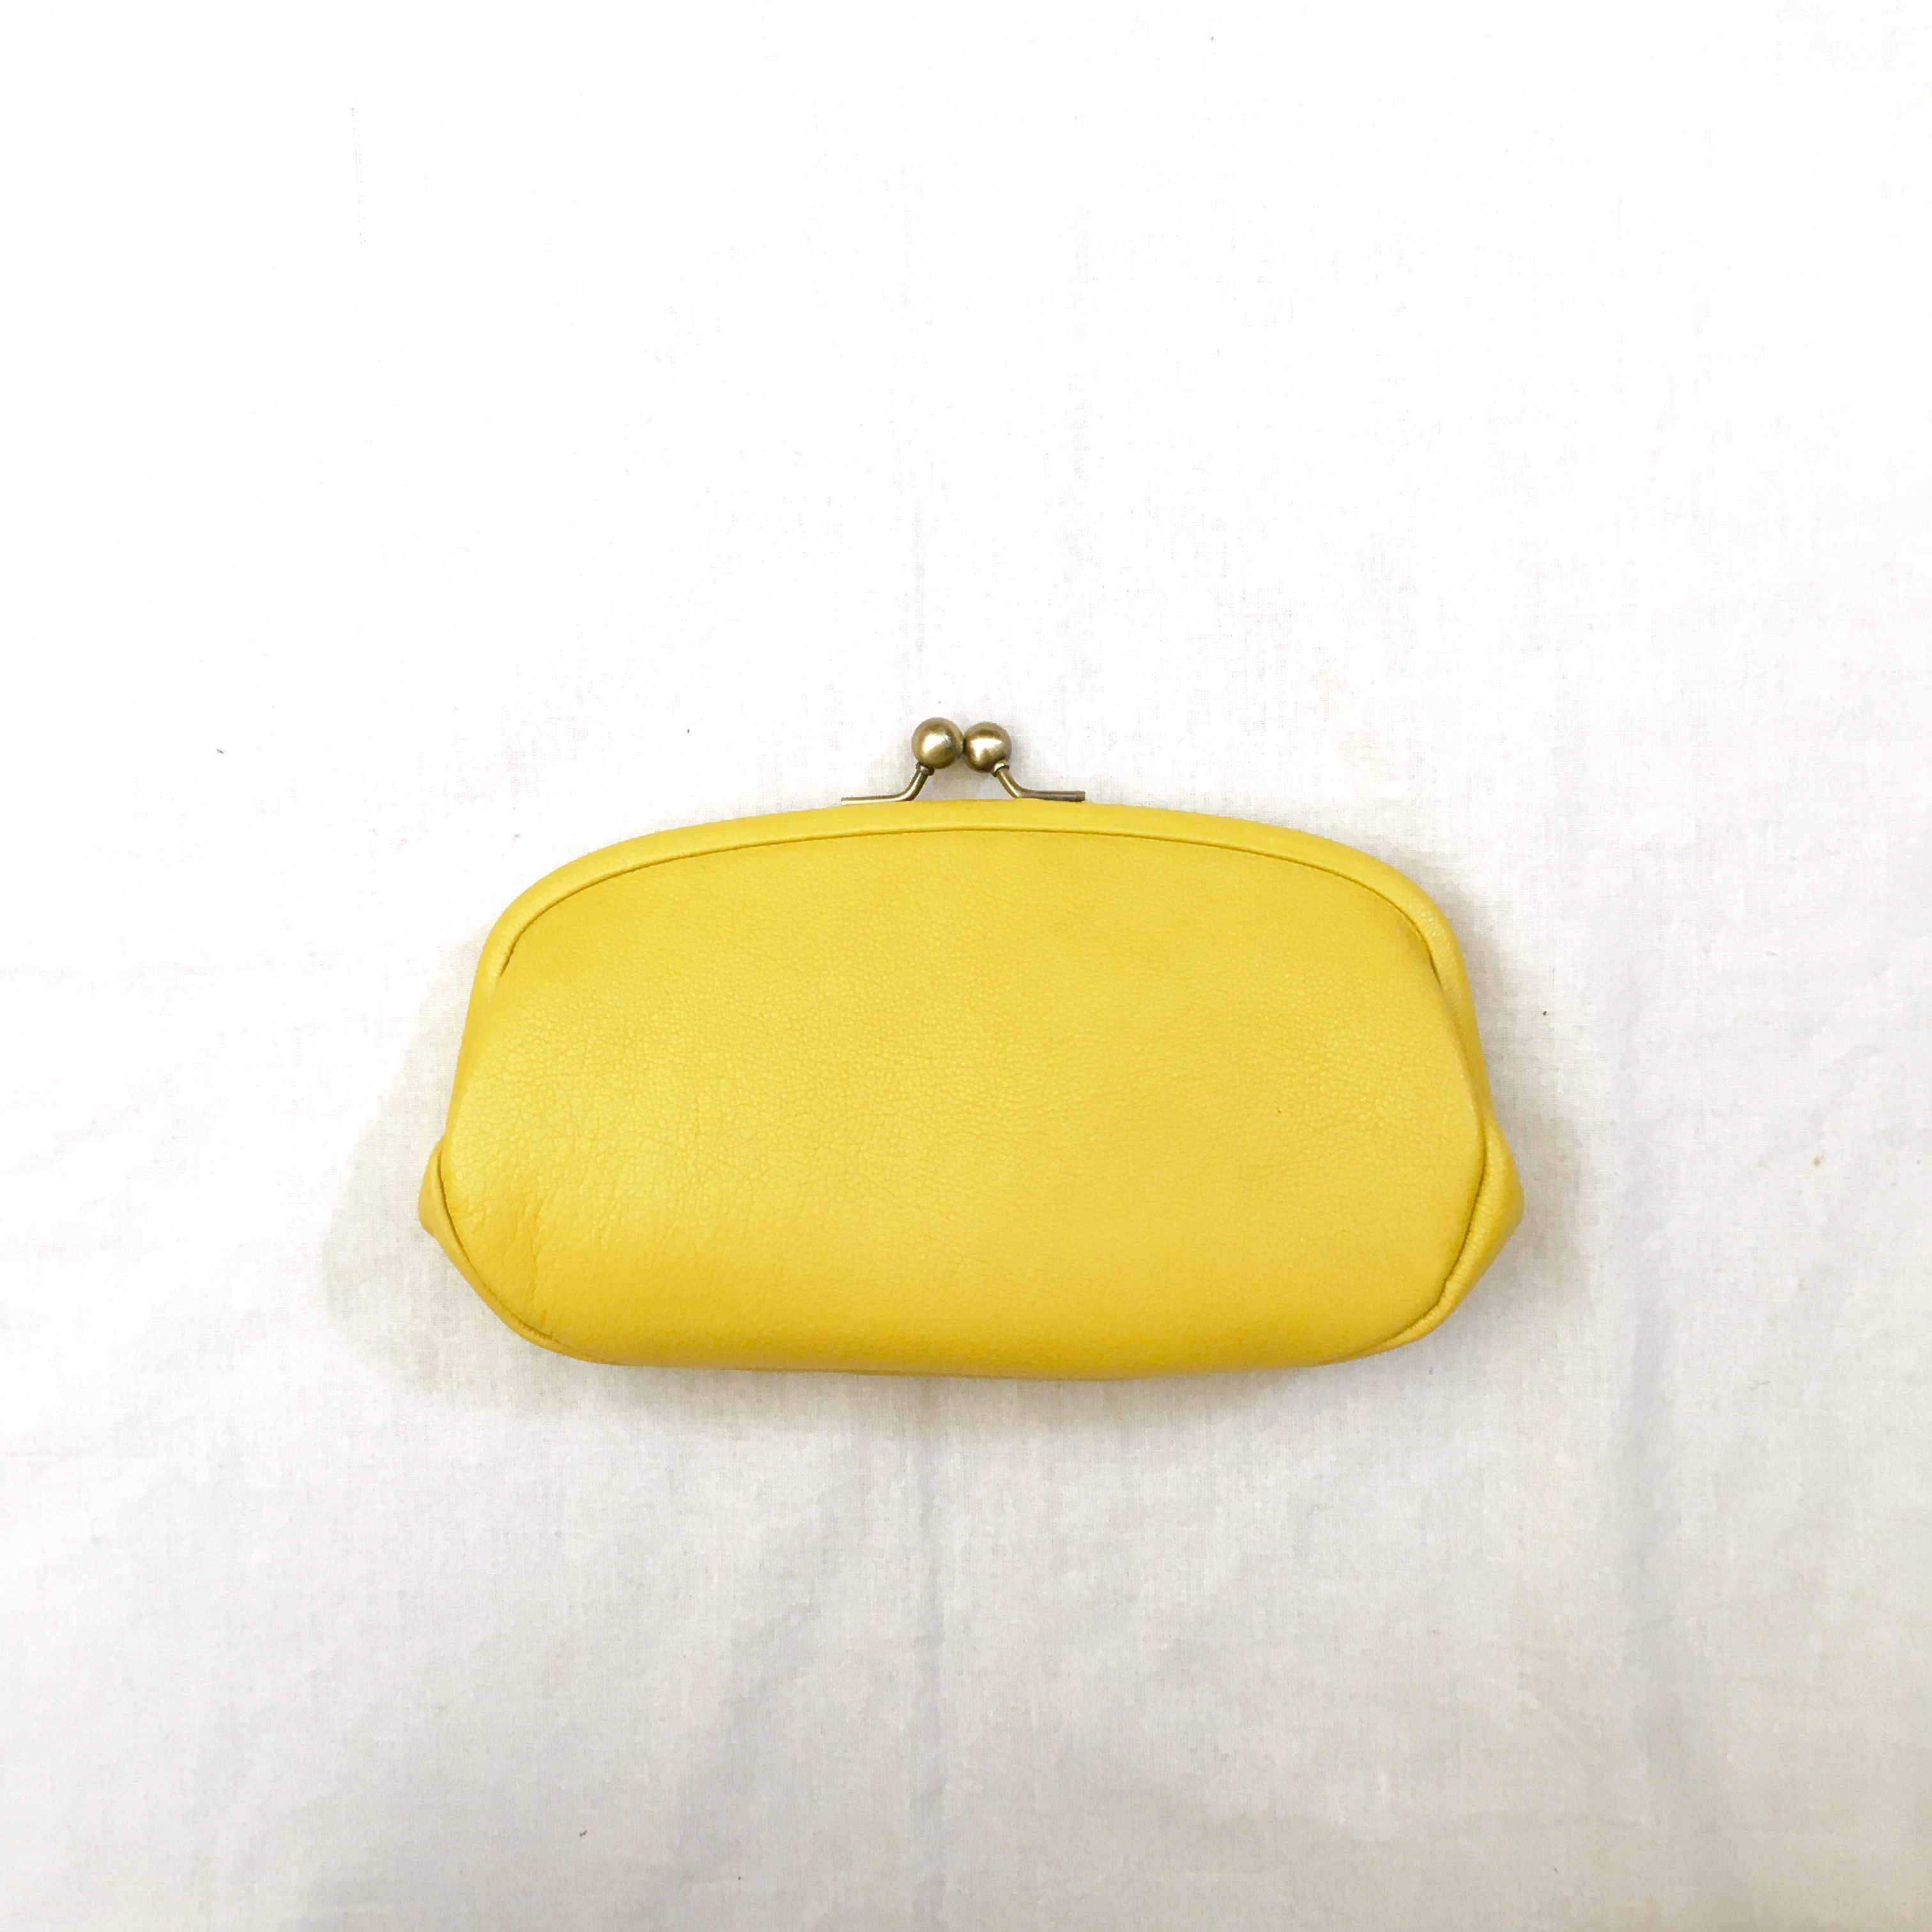 ANVOCOEUR Marietta long wallet